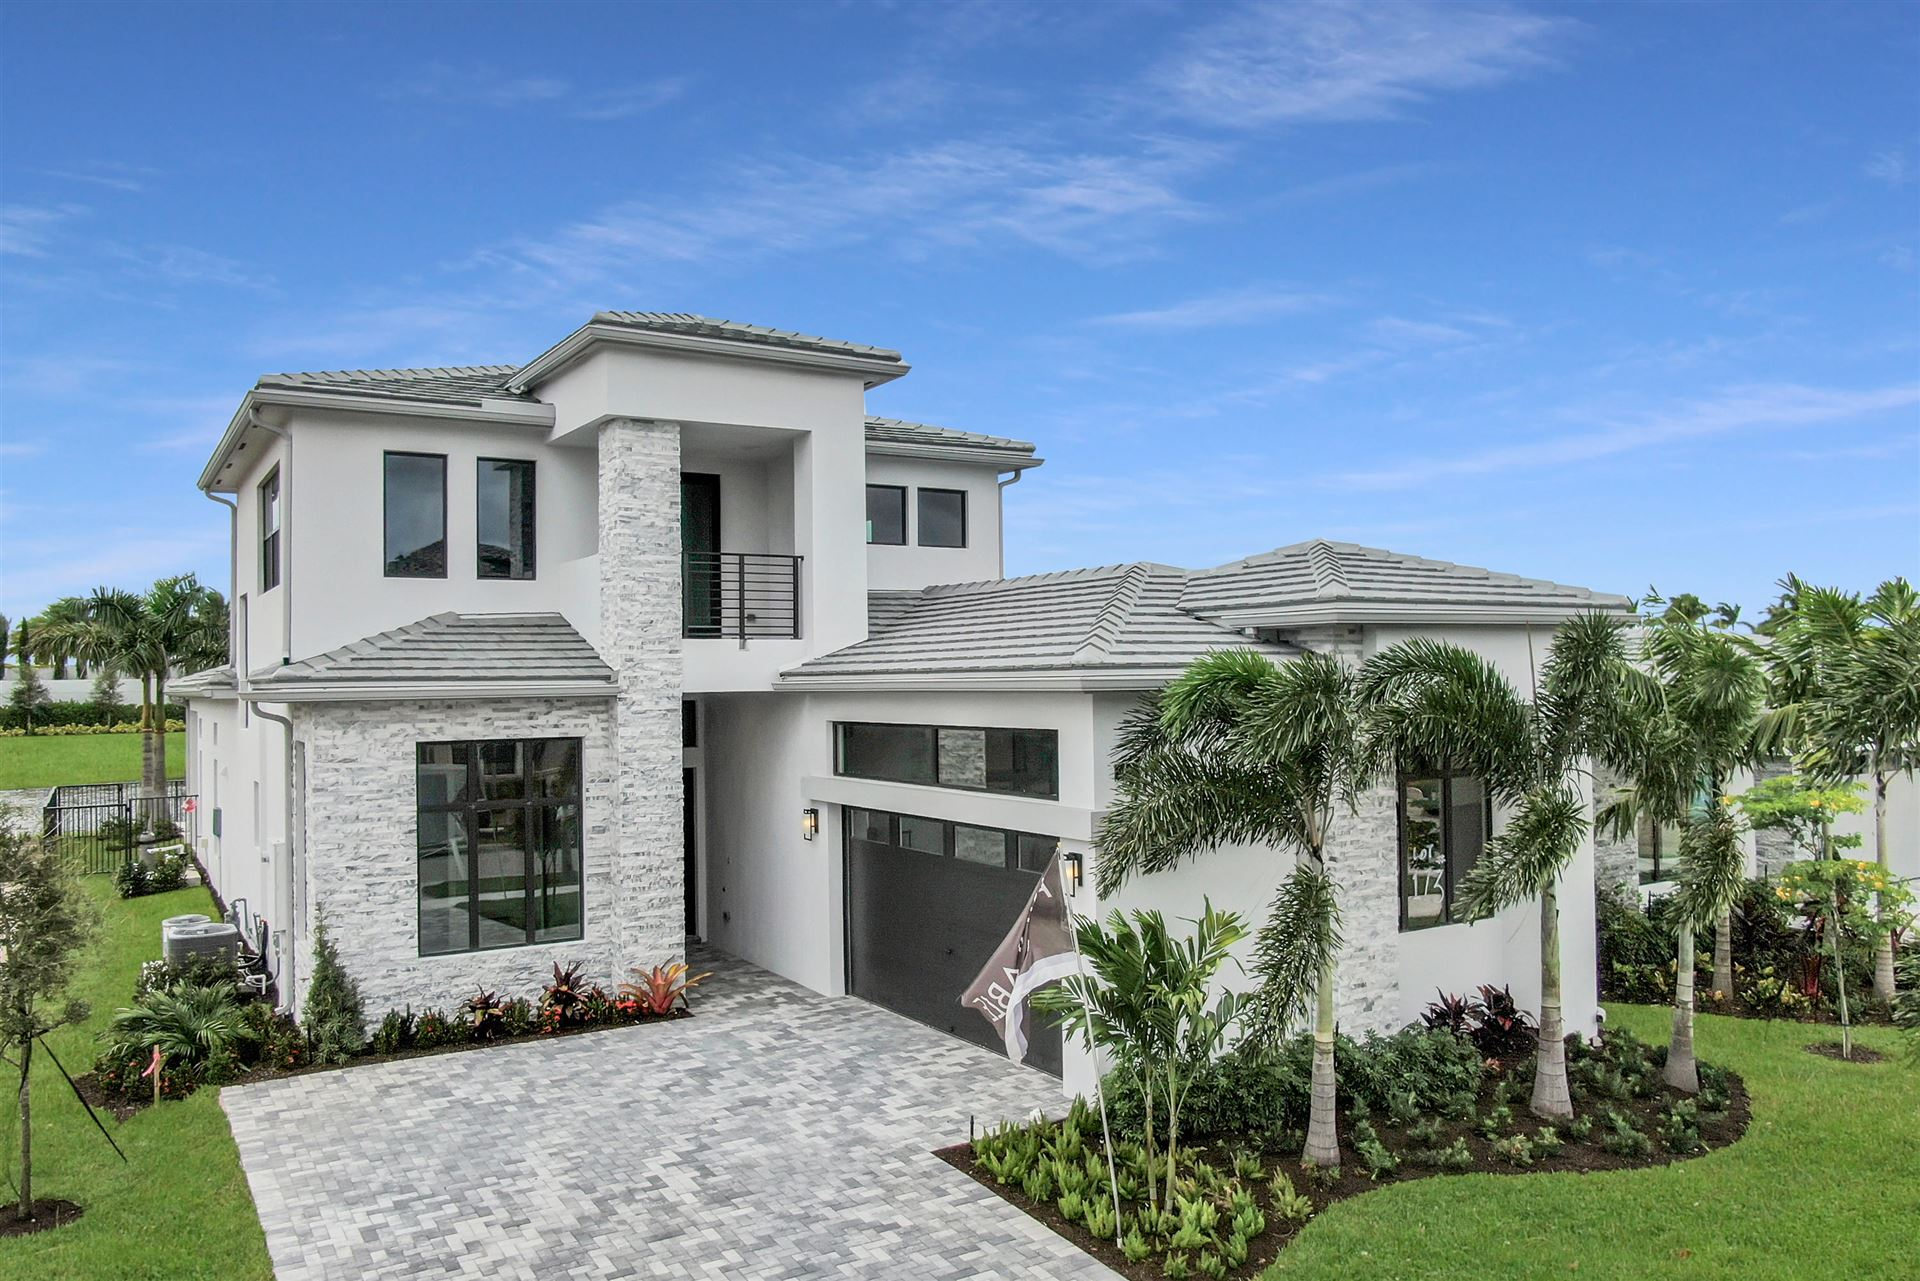 9039 Chauvet Way, Boca Raton, FL 33496 - #: RX-10575279